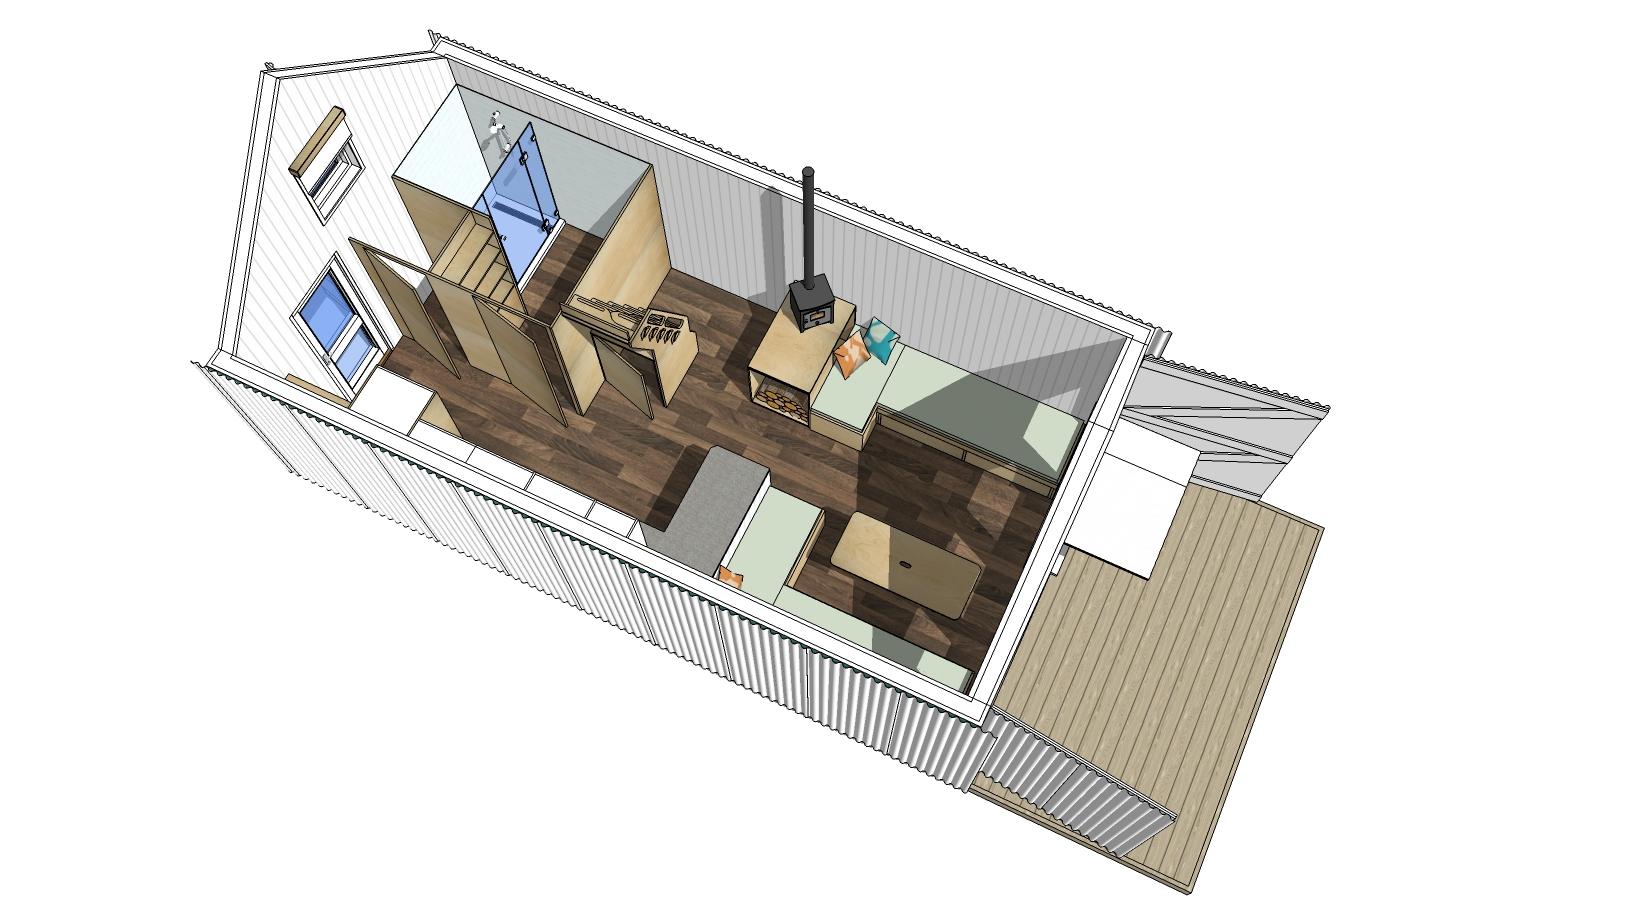 cadland estate 2x huts - 5.jpg